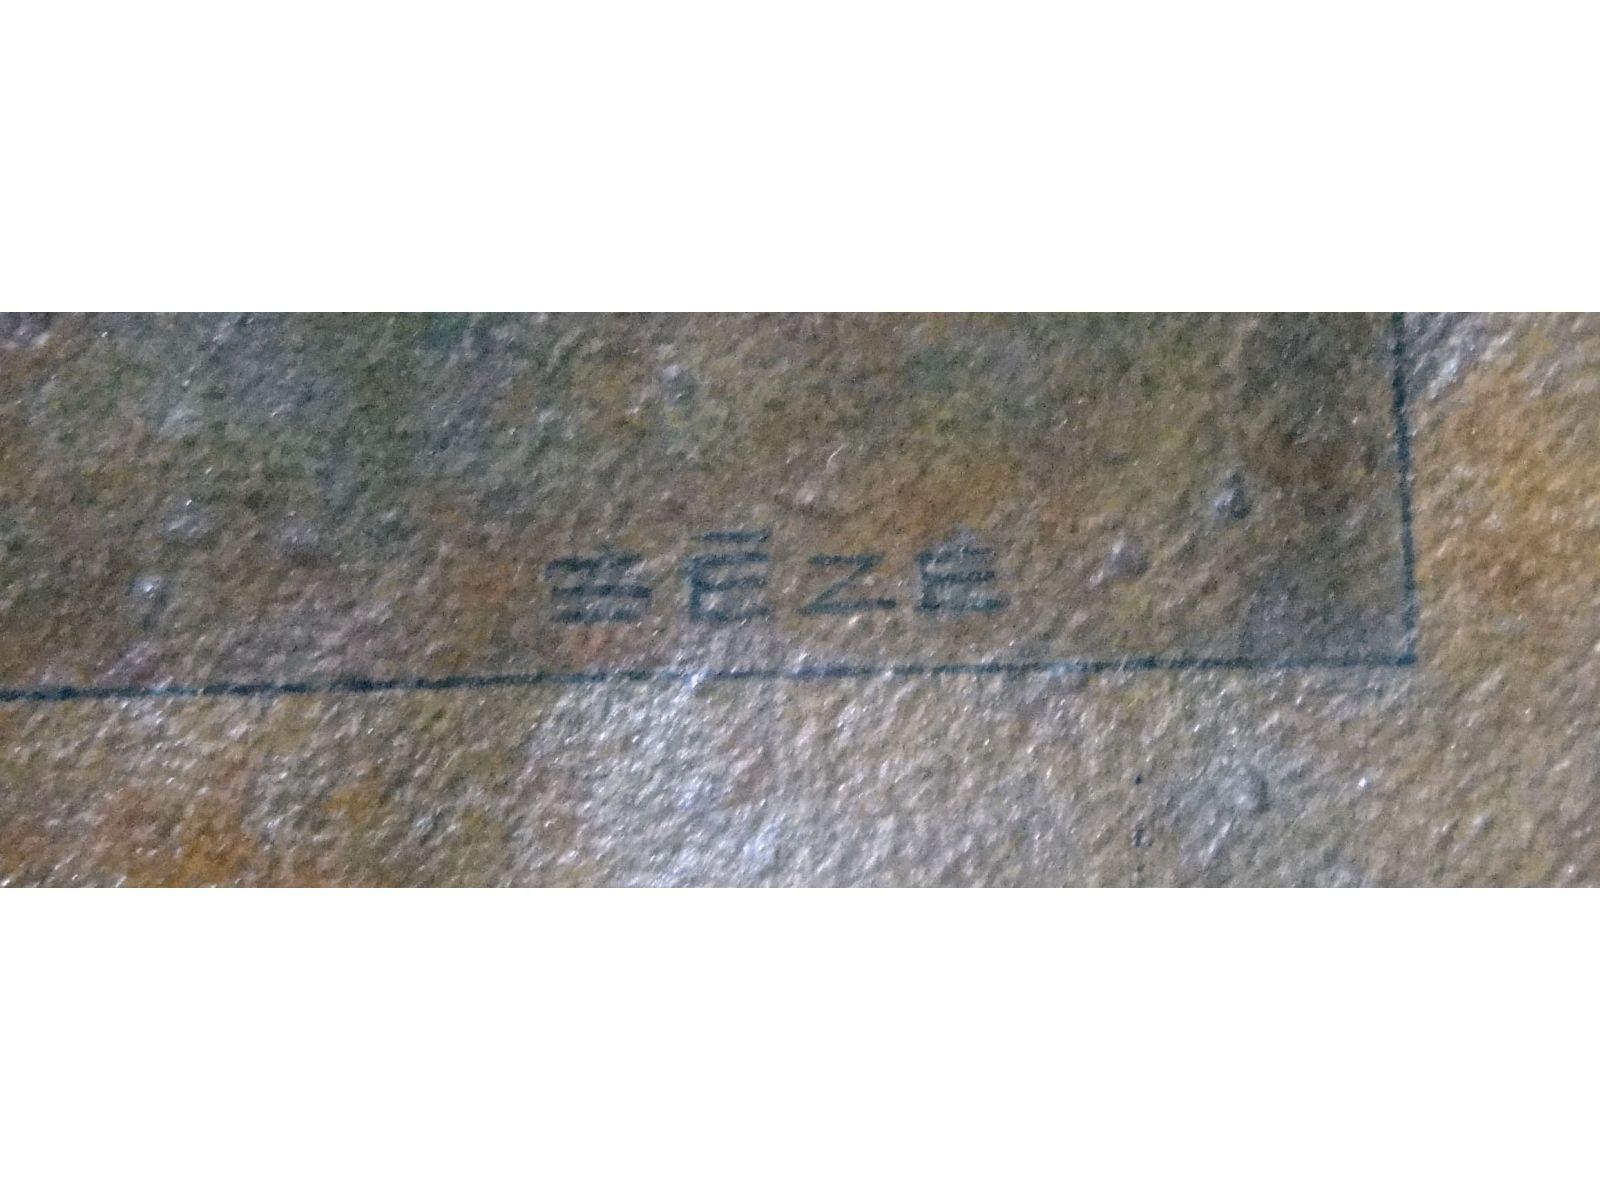 DSC04490.JPG (1600×1200)